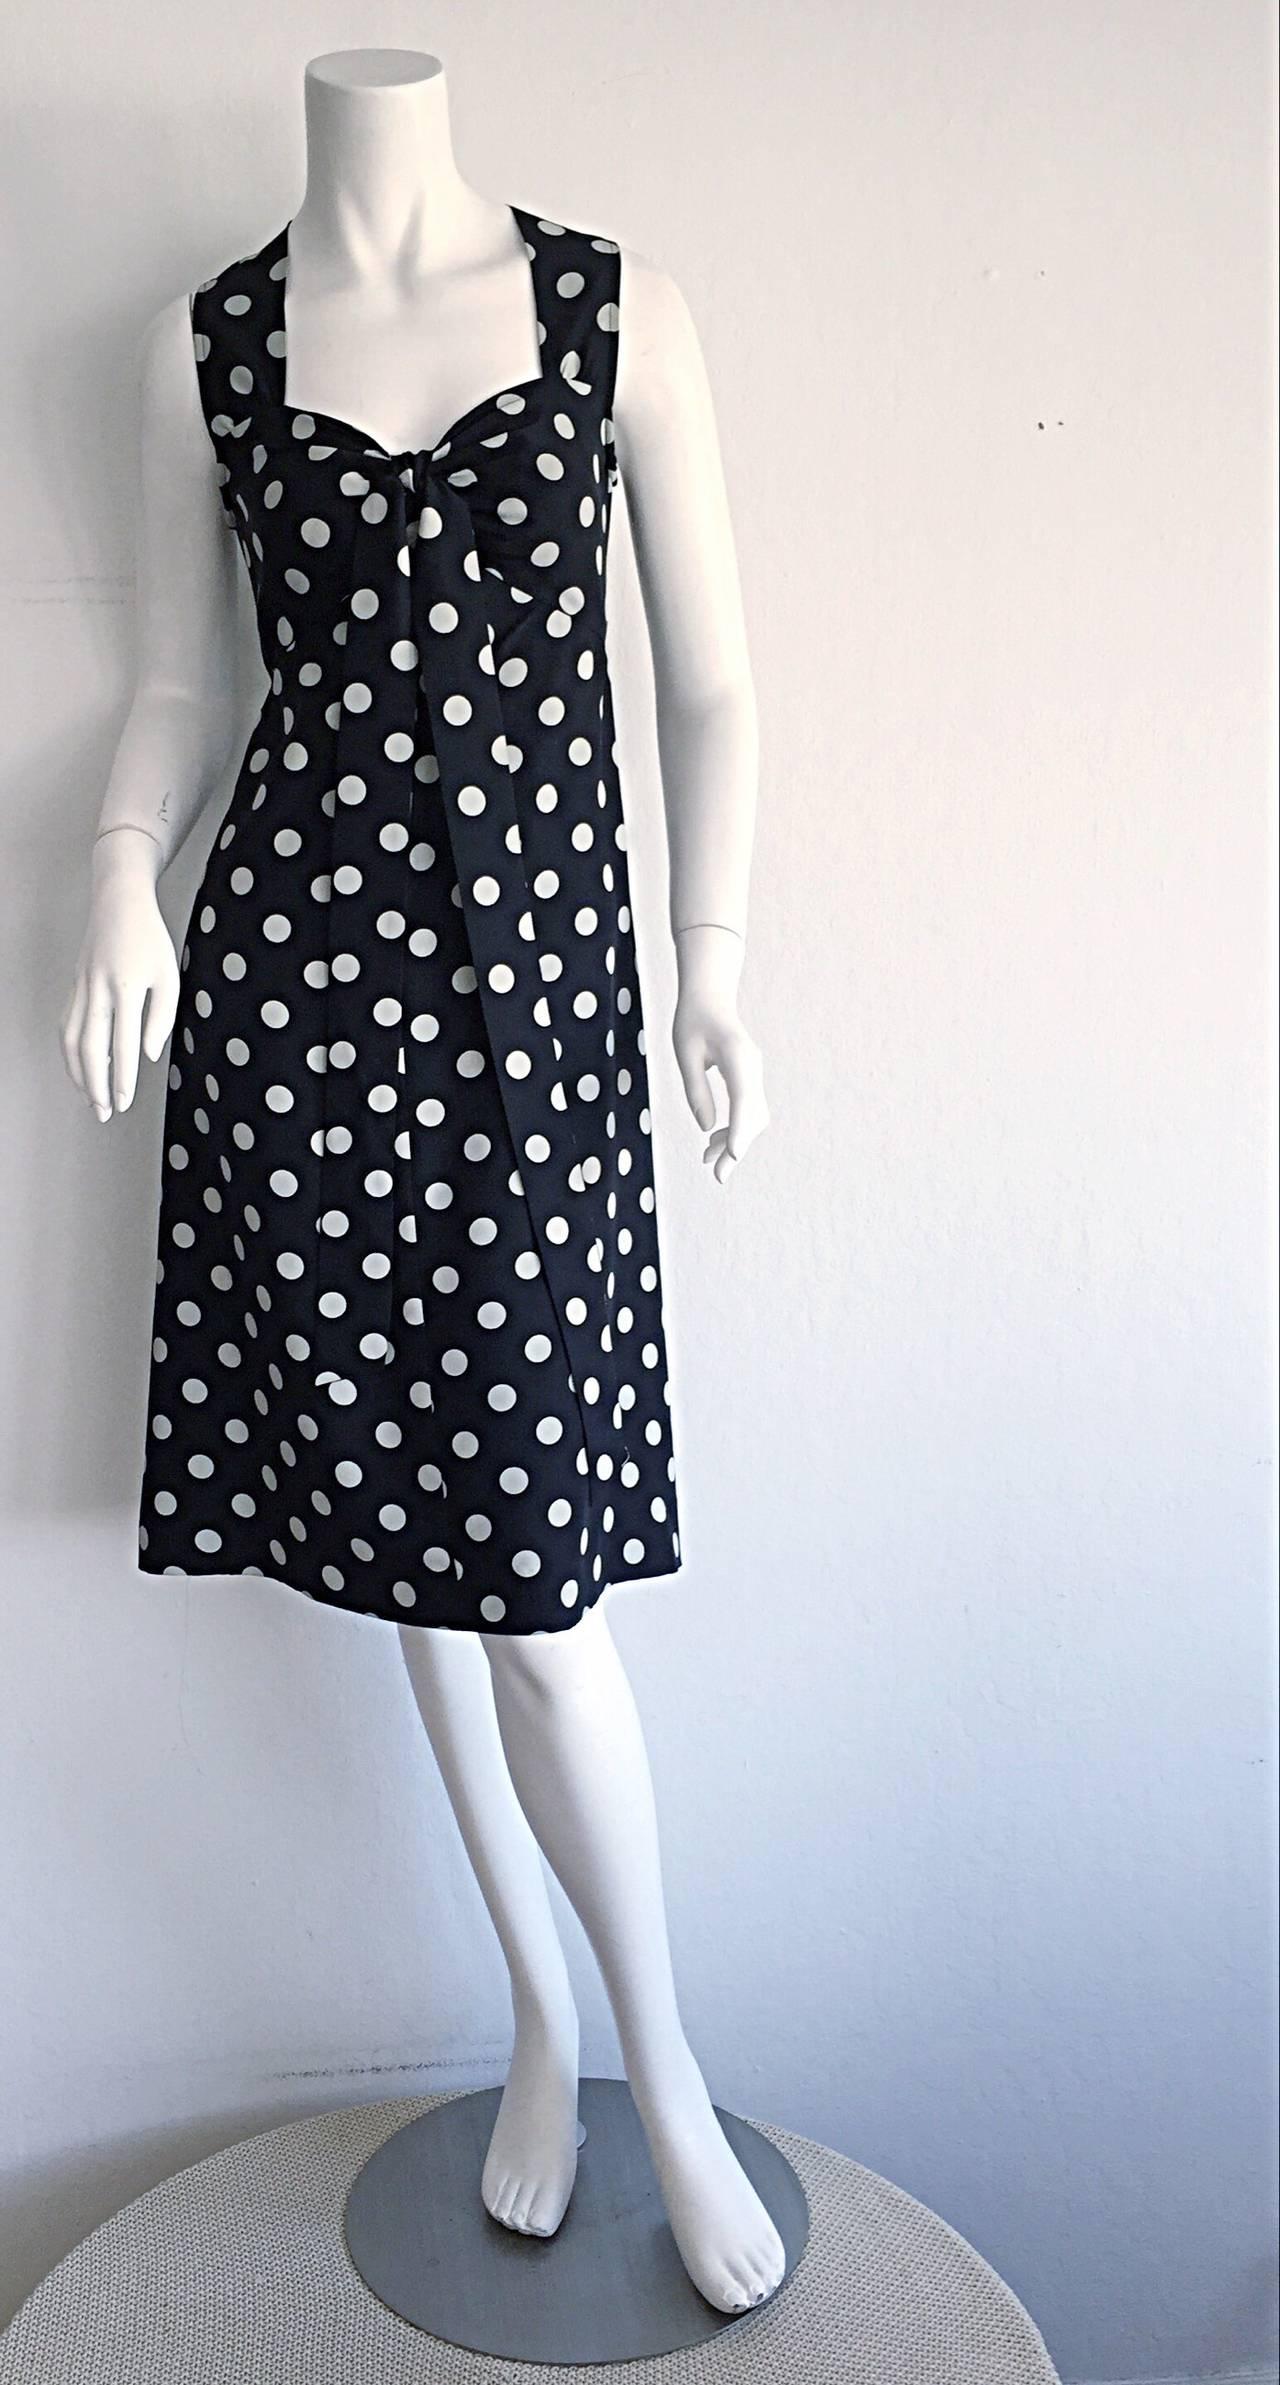 1980s Saint Laurent Rive Gauche  Navy Blue & White Polka Dot Babydoll Bow Dress 3